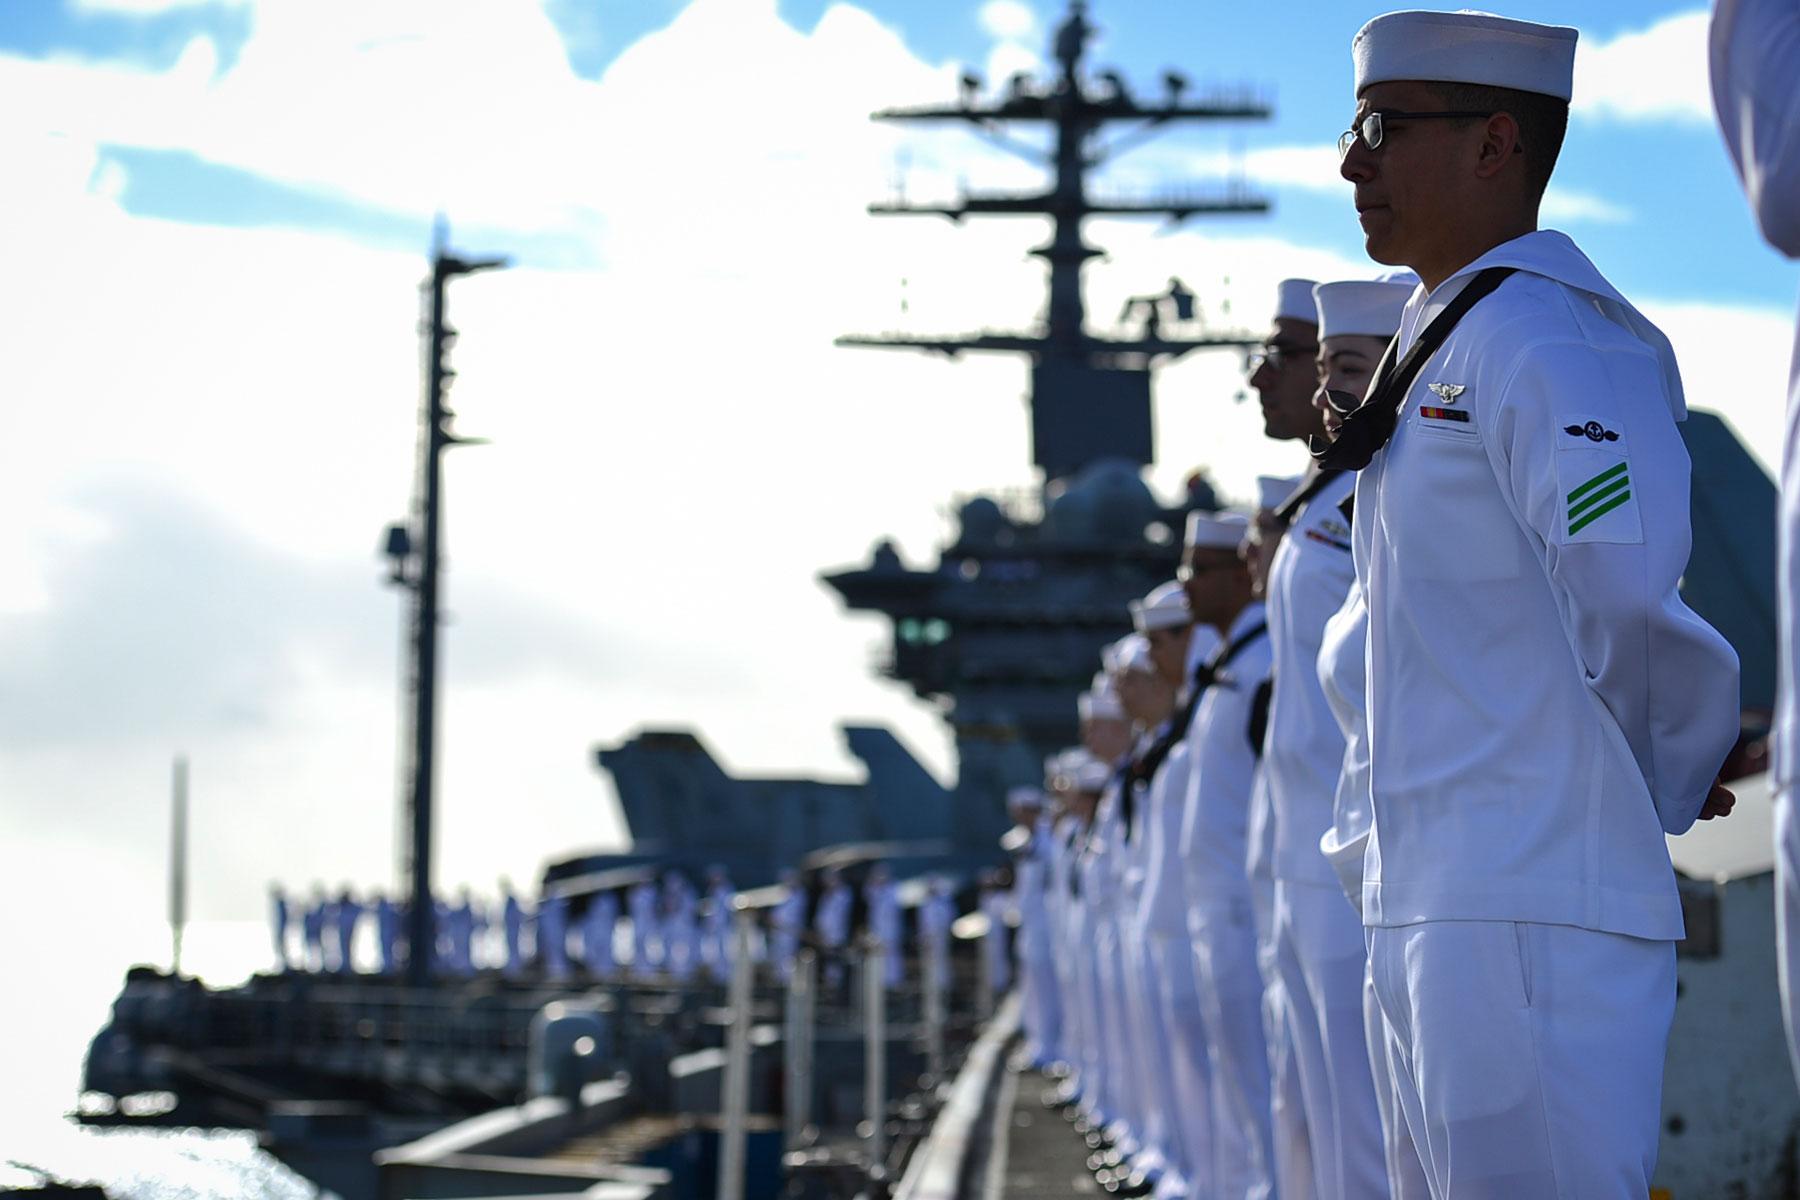 Uss Nimitz Deployment Schedule 2019 Sailors Should Expect More Unpredictable Deployments, MCPON Says